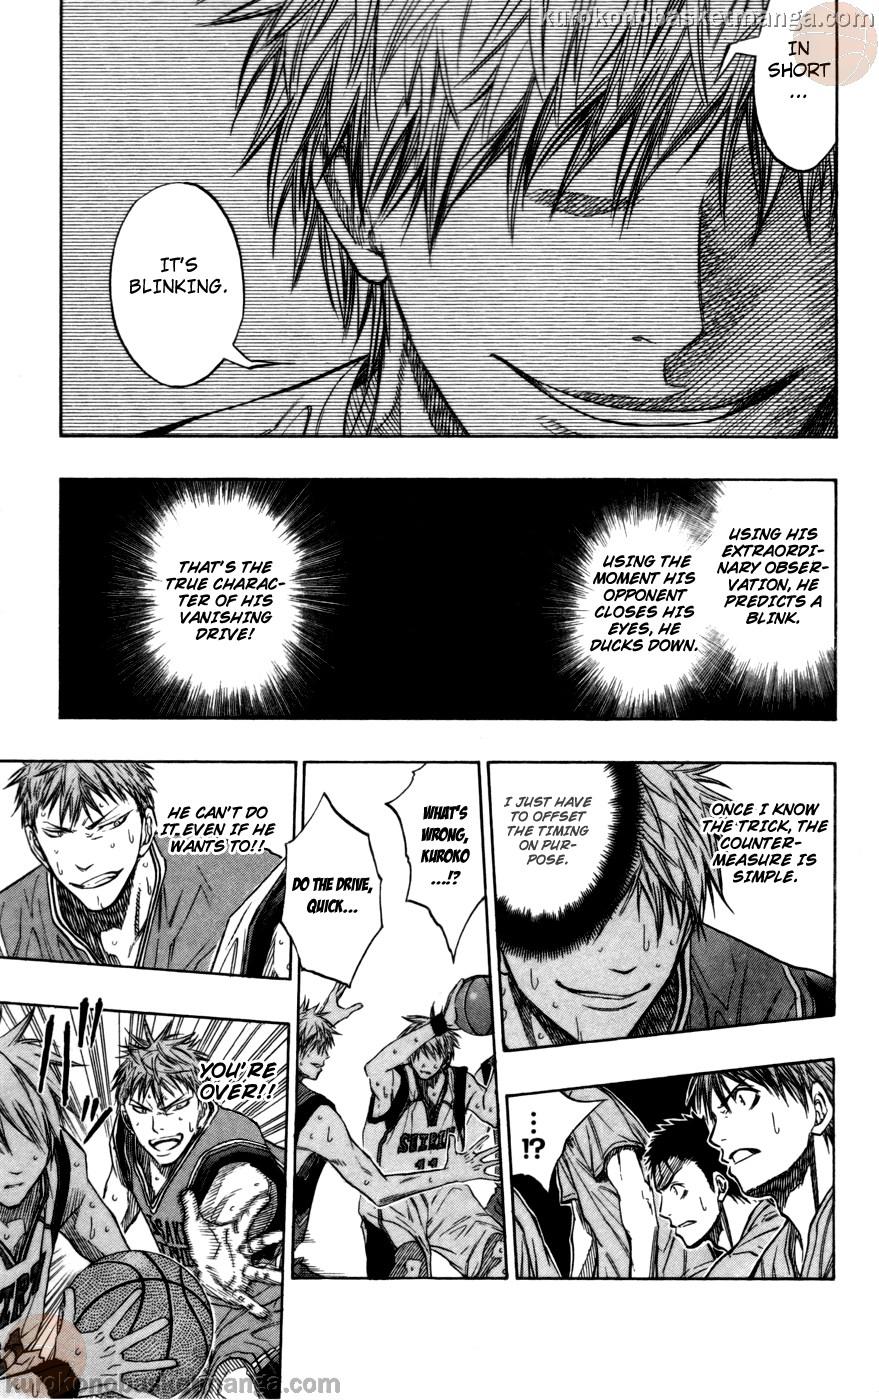 Kuroko no Basket Manga Chapter 103 - Image 15